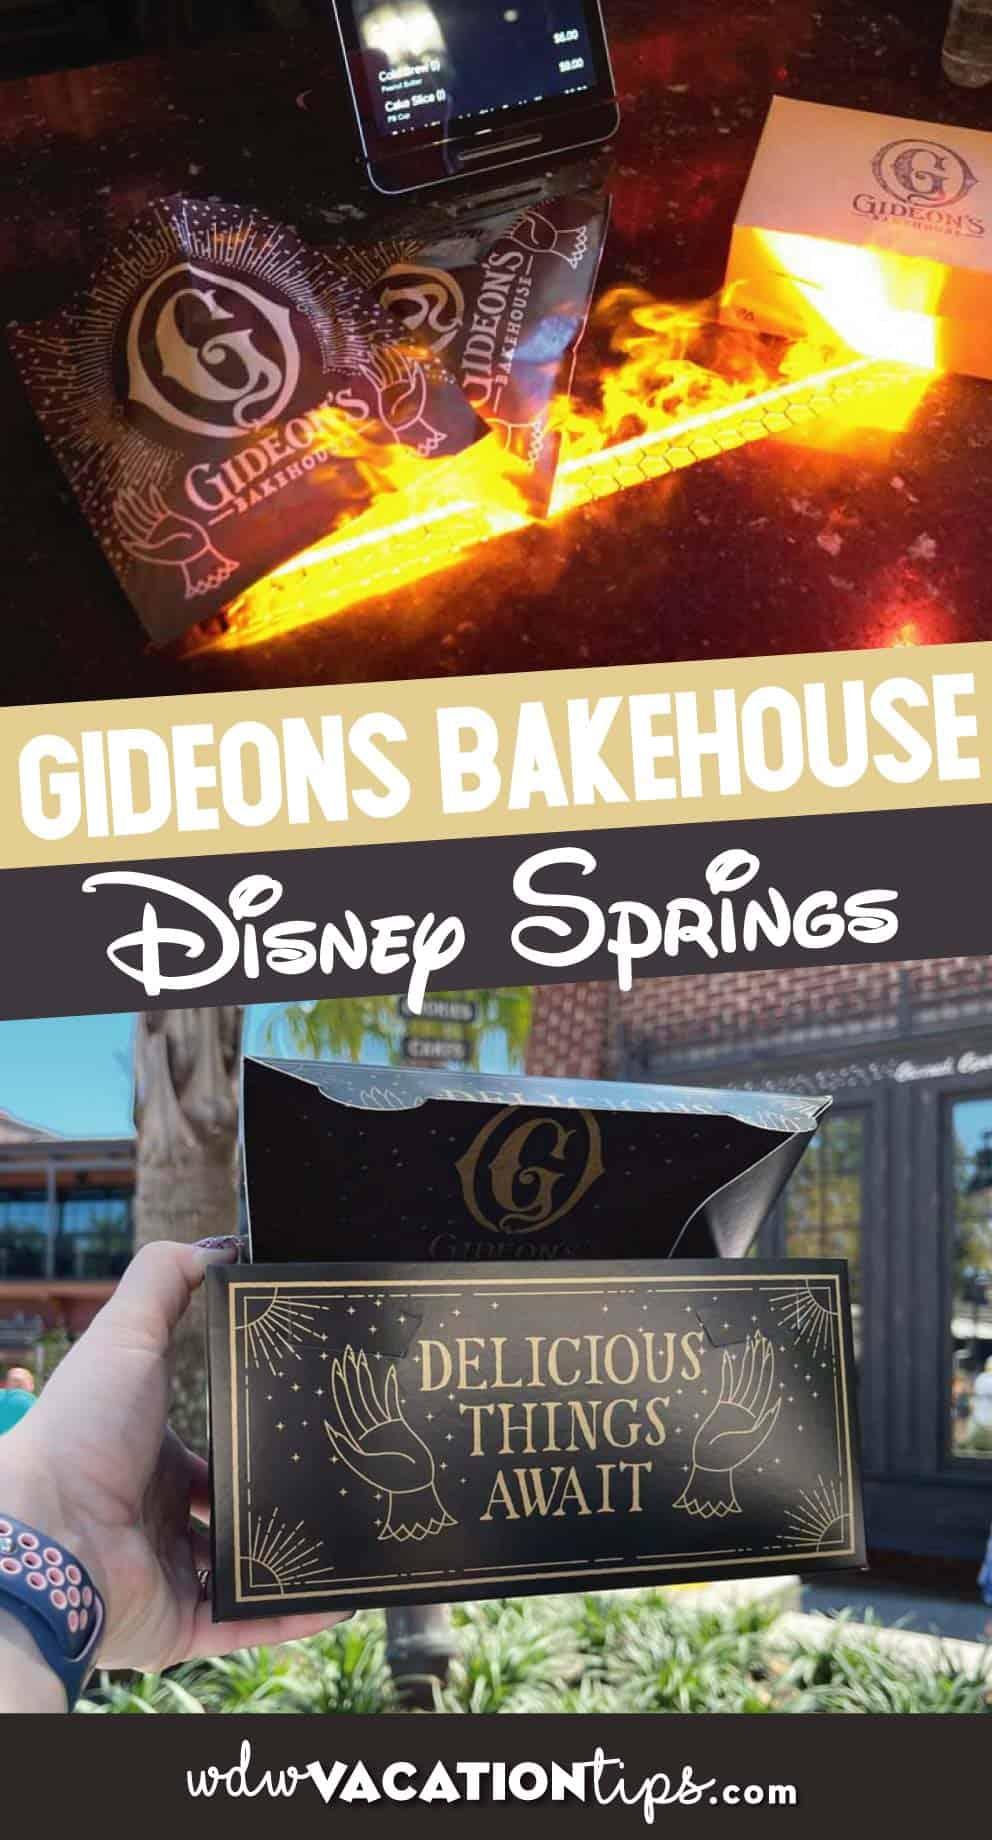 Gideons Bakehouse Review Disney Springs